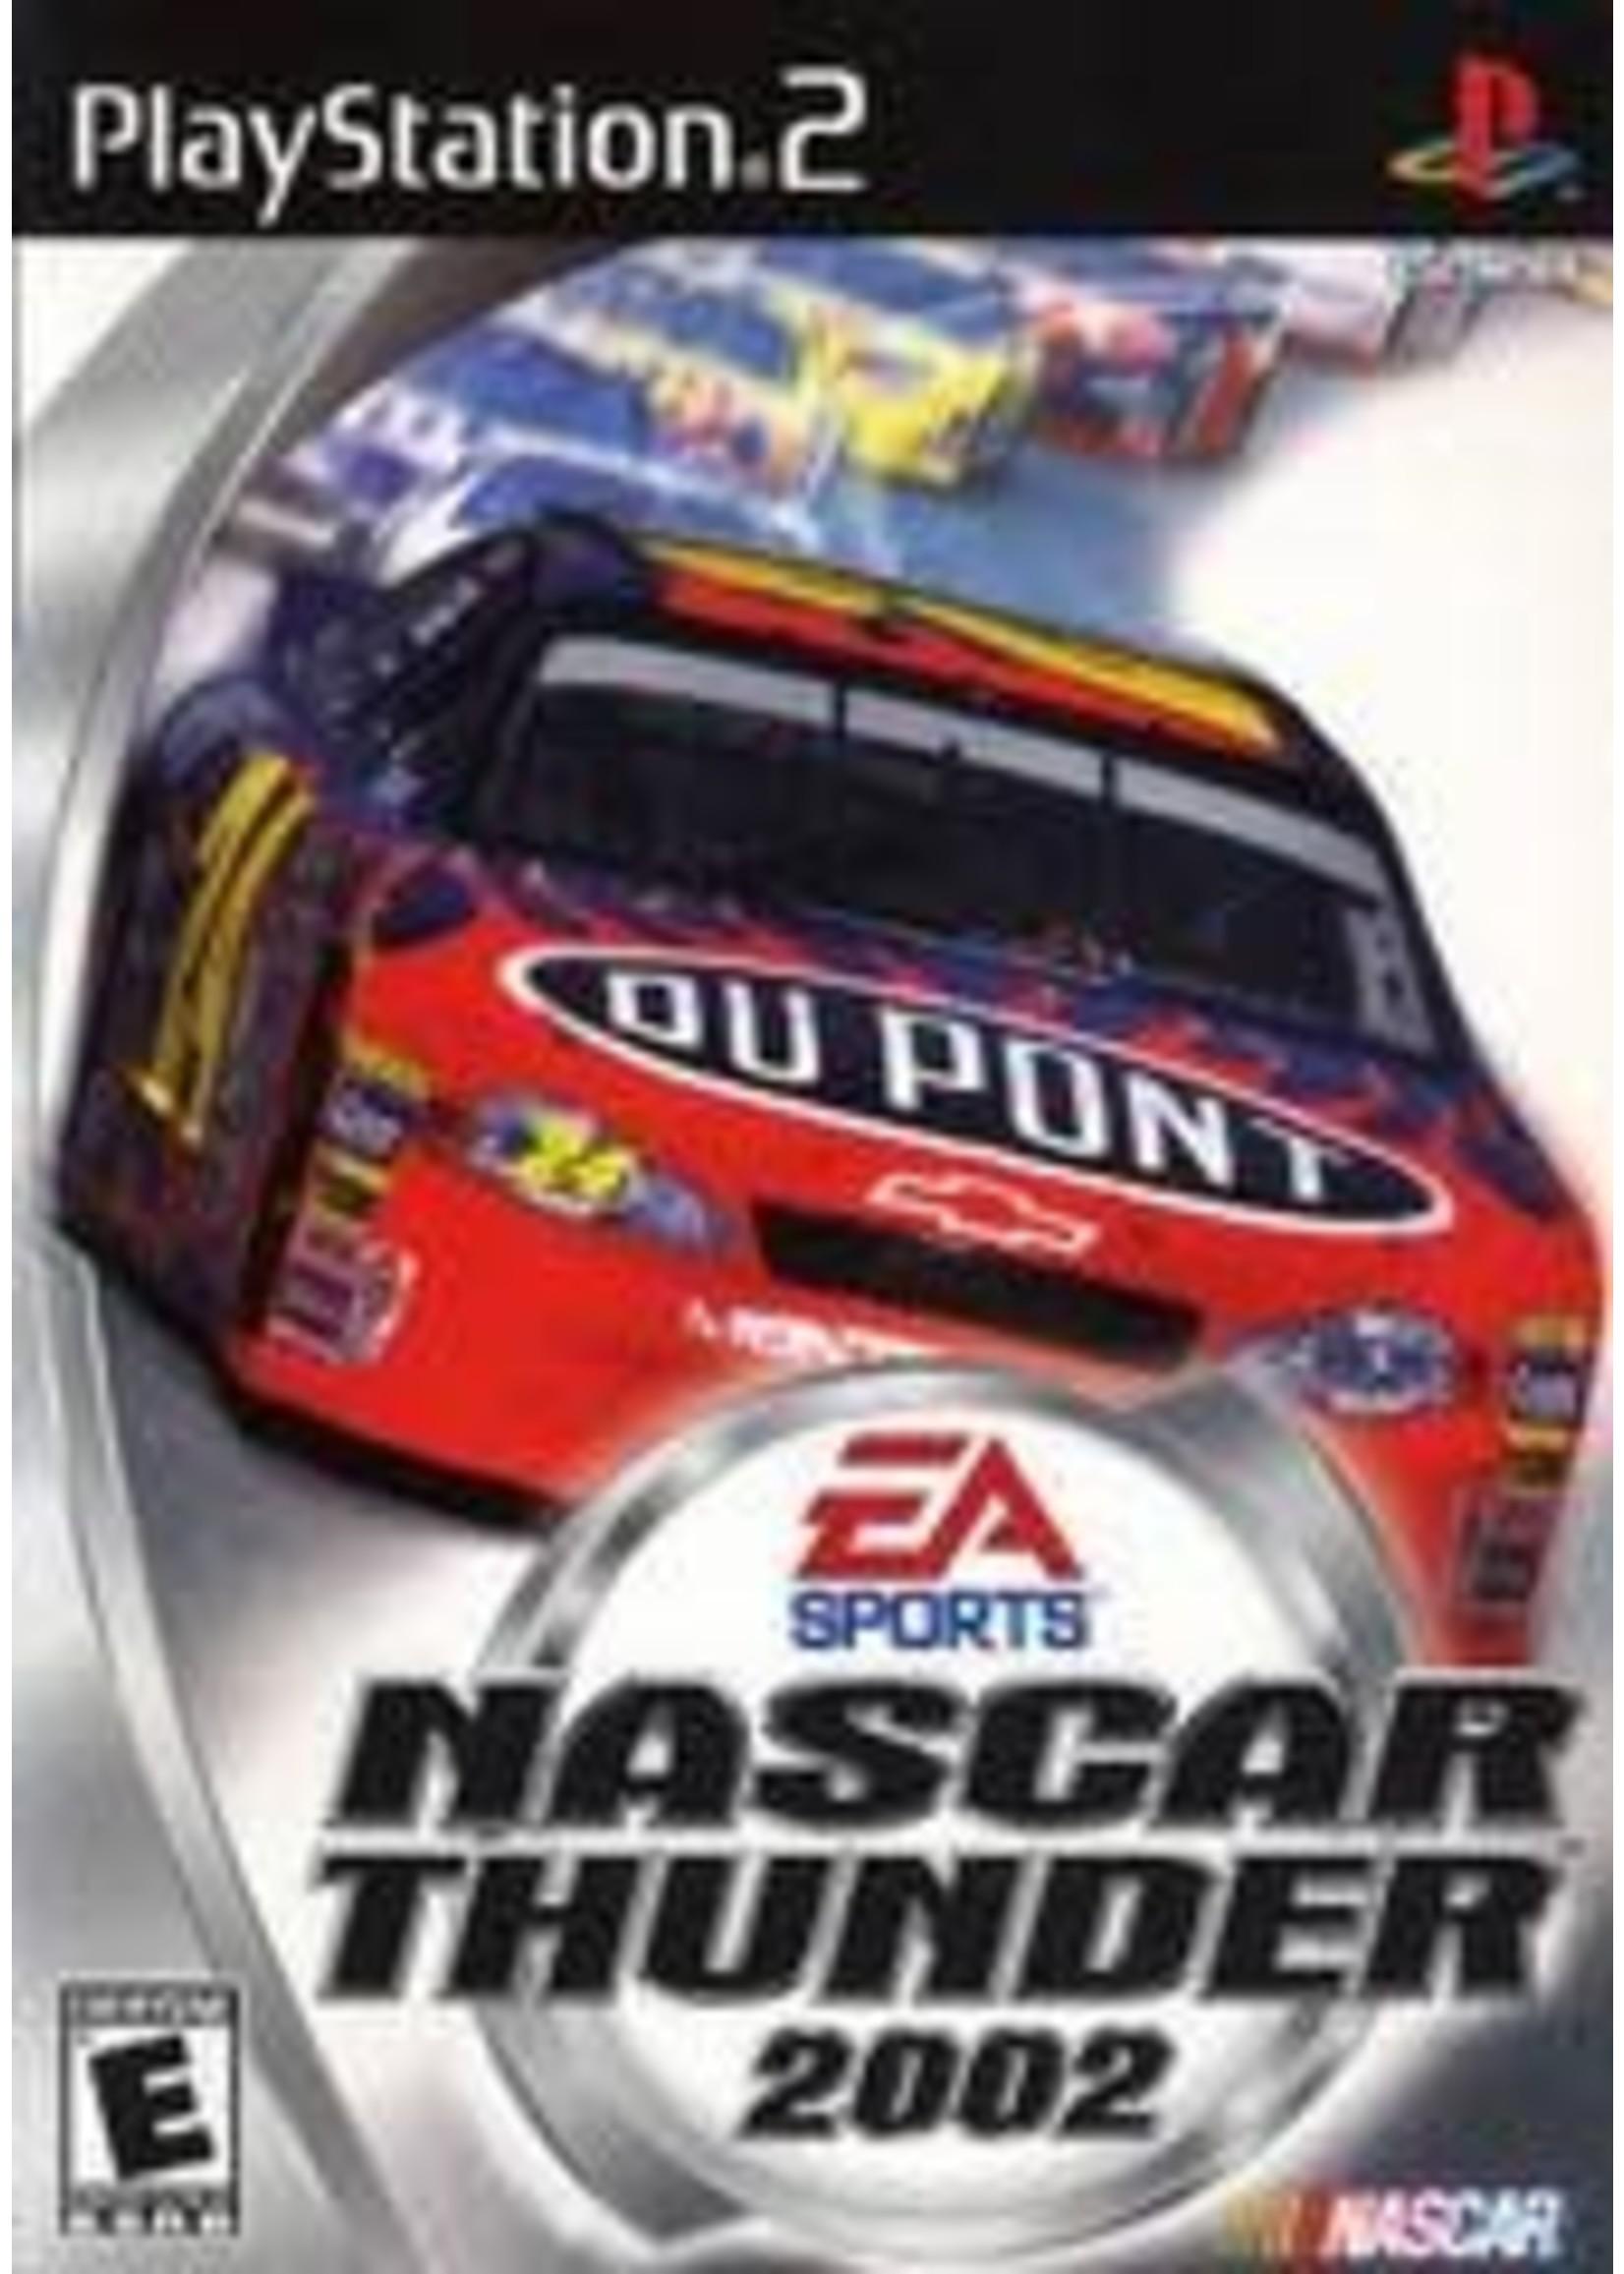 NASCAR Thunder 2002 Playstation 2